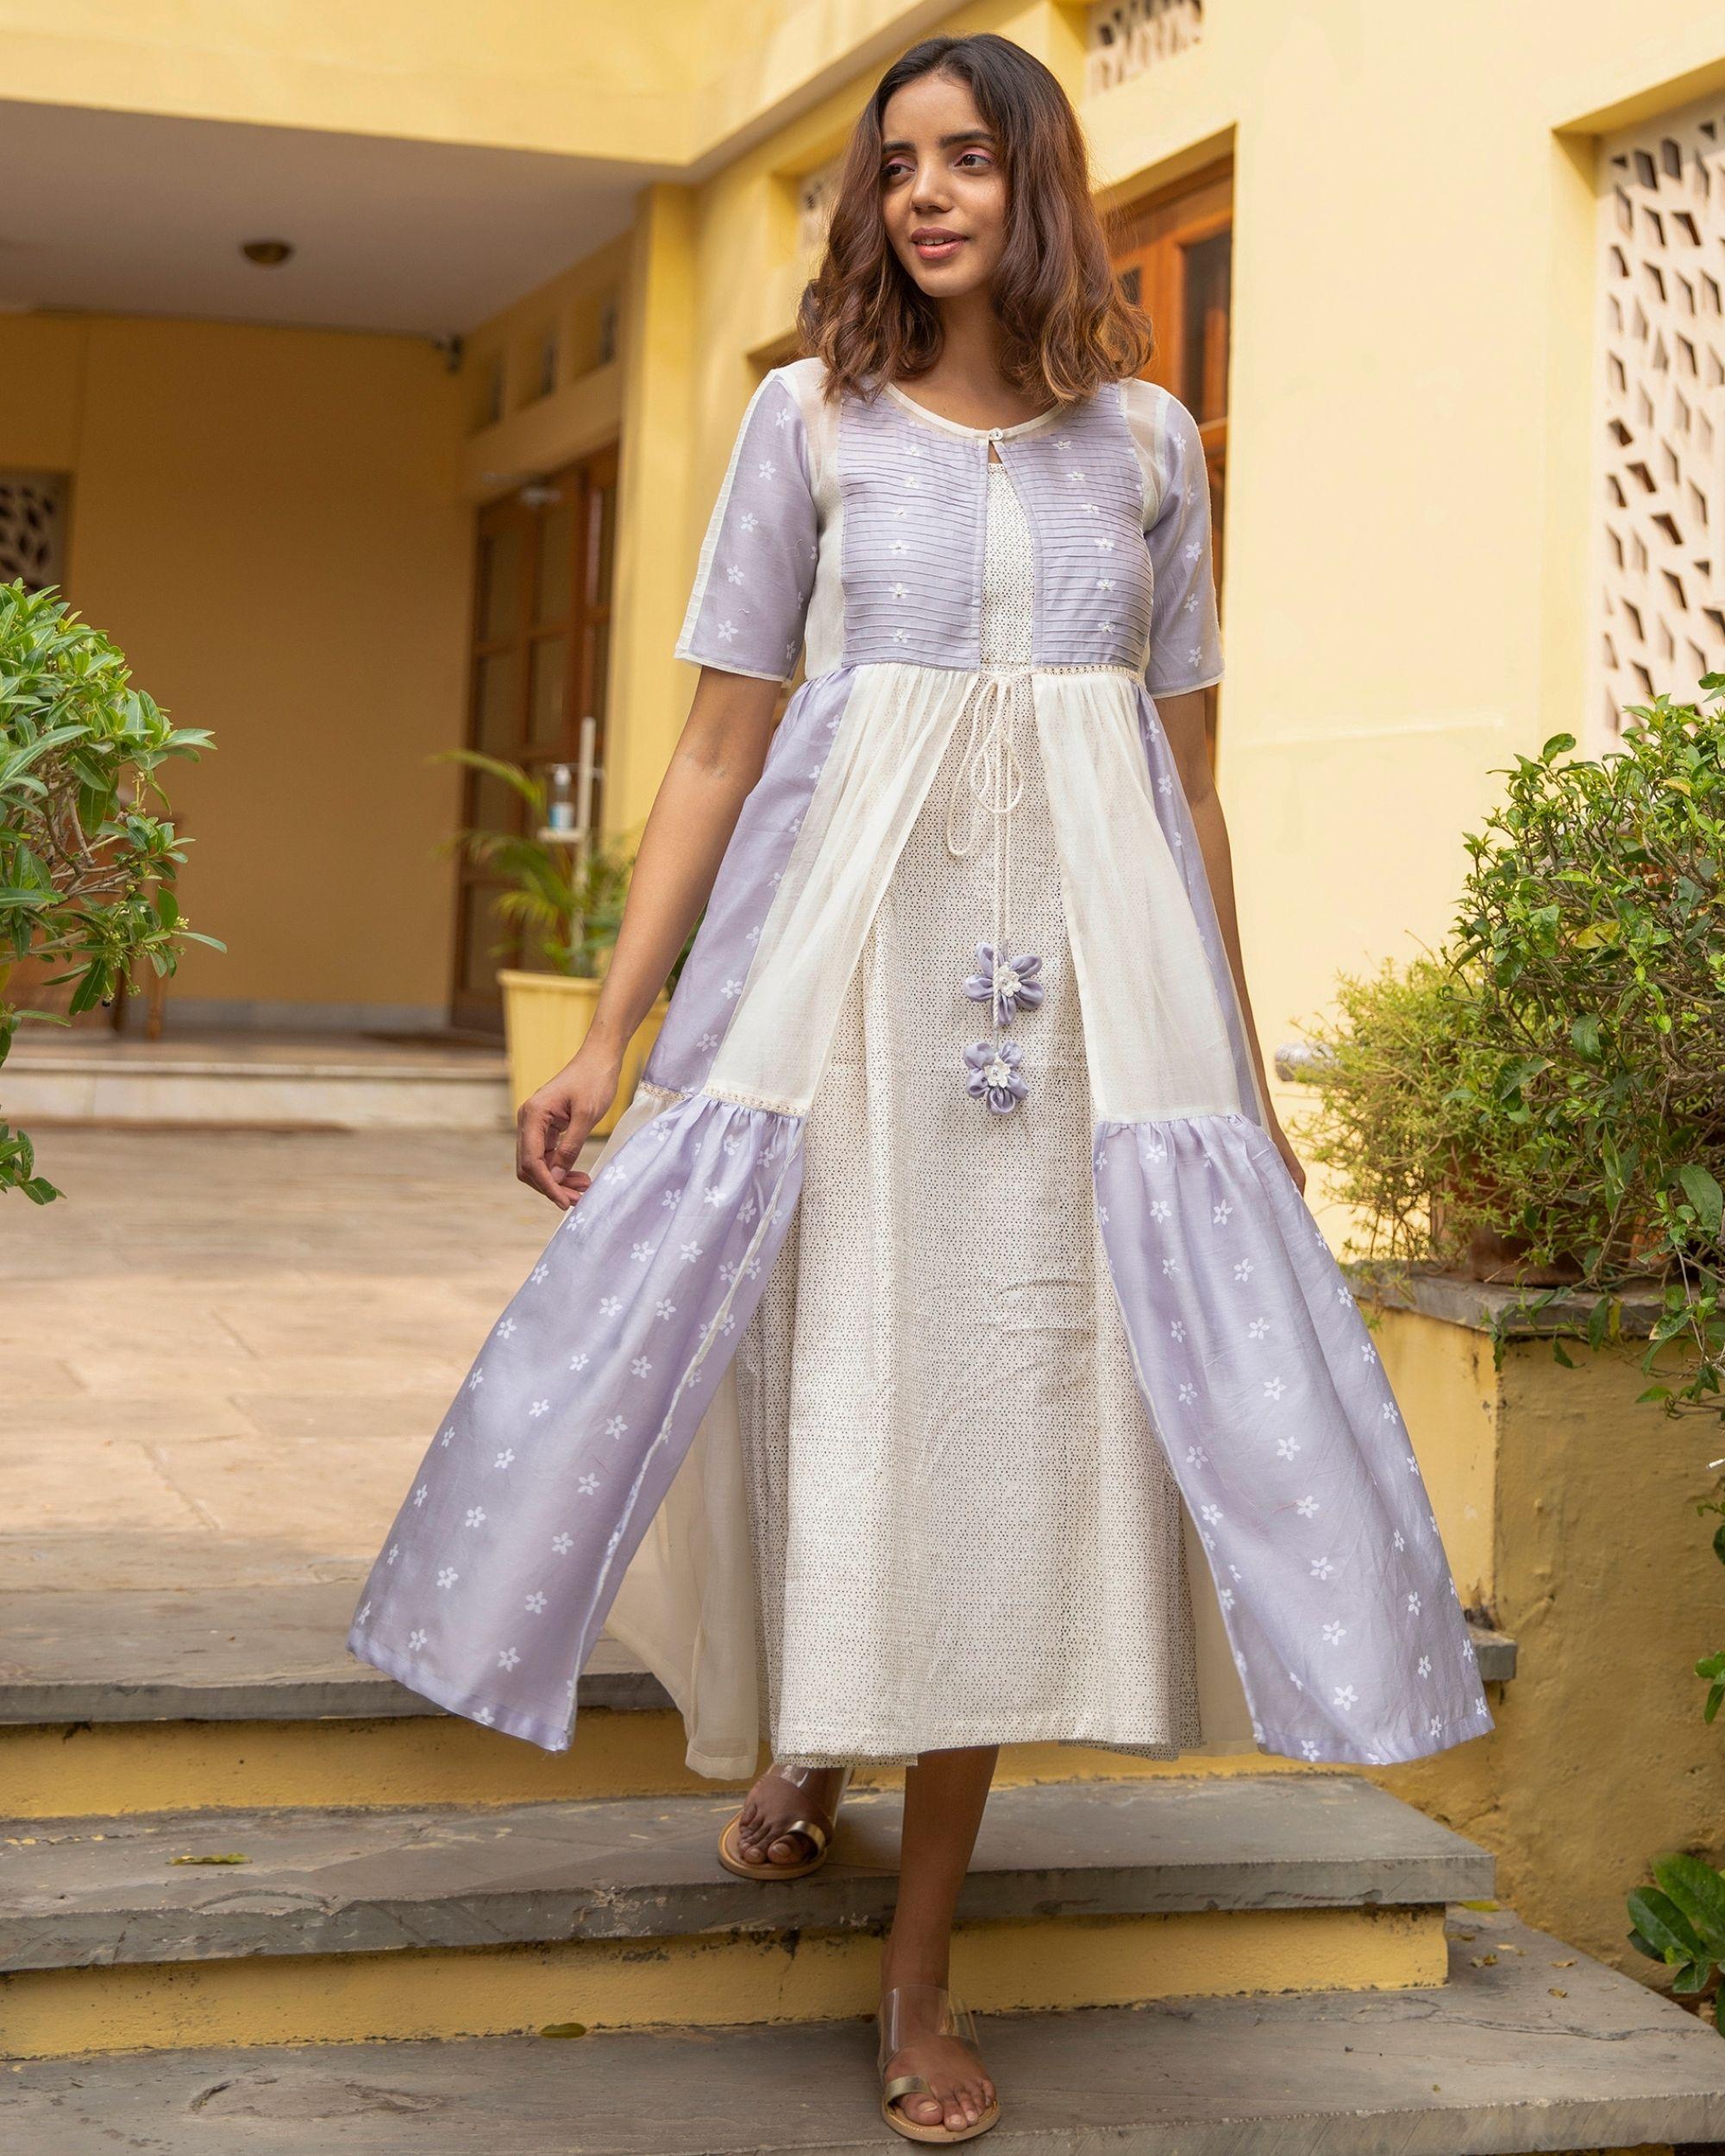 Lilac mogra tiered dress